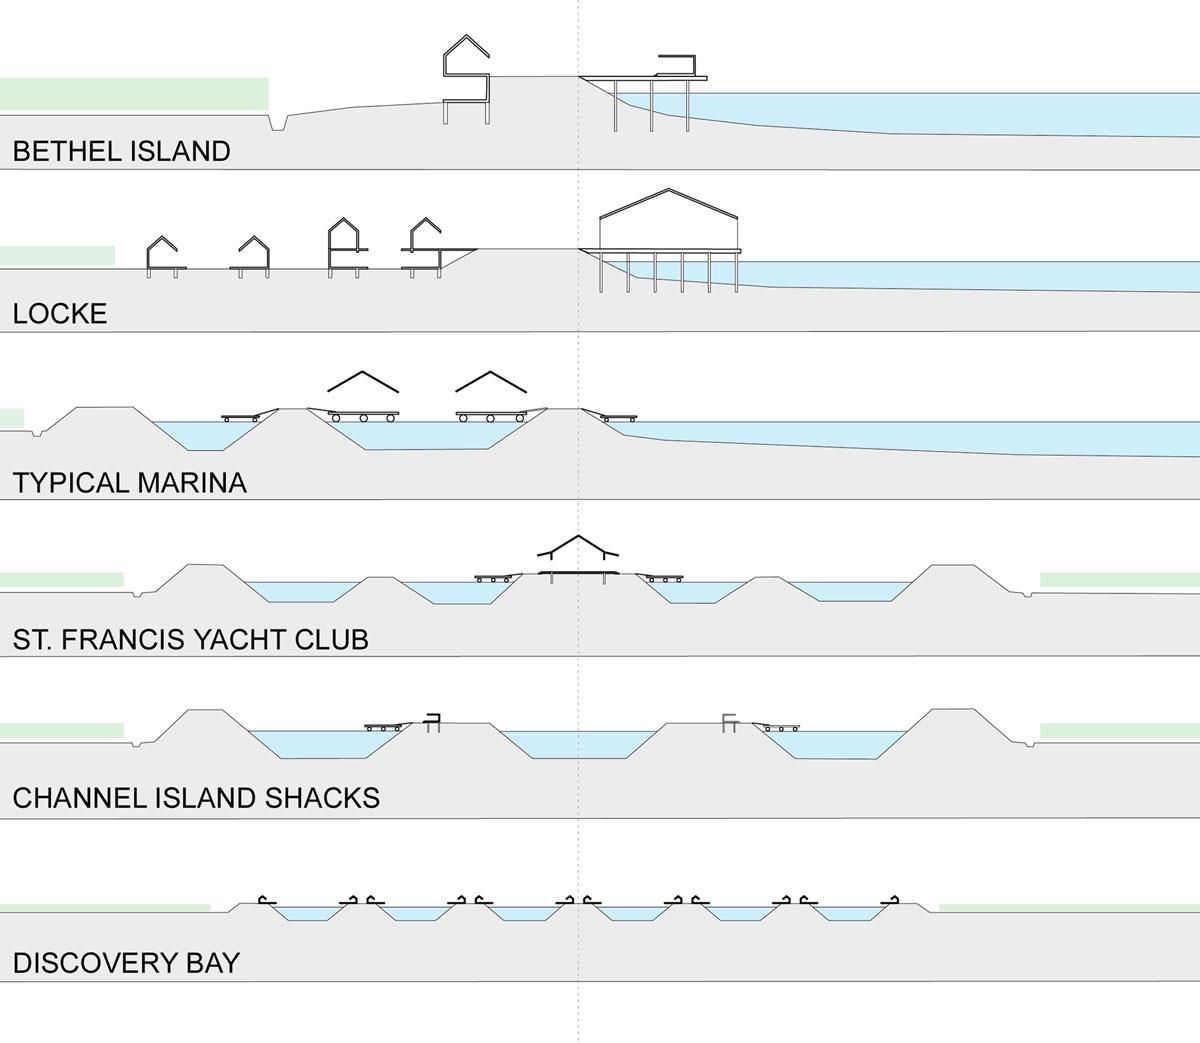 levee cross section diagram 240 volt led light wiring delta national park tags